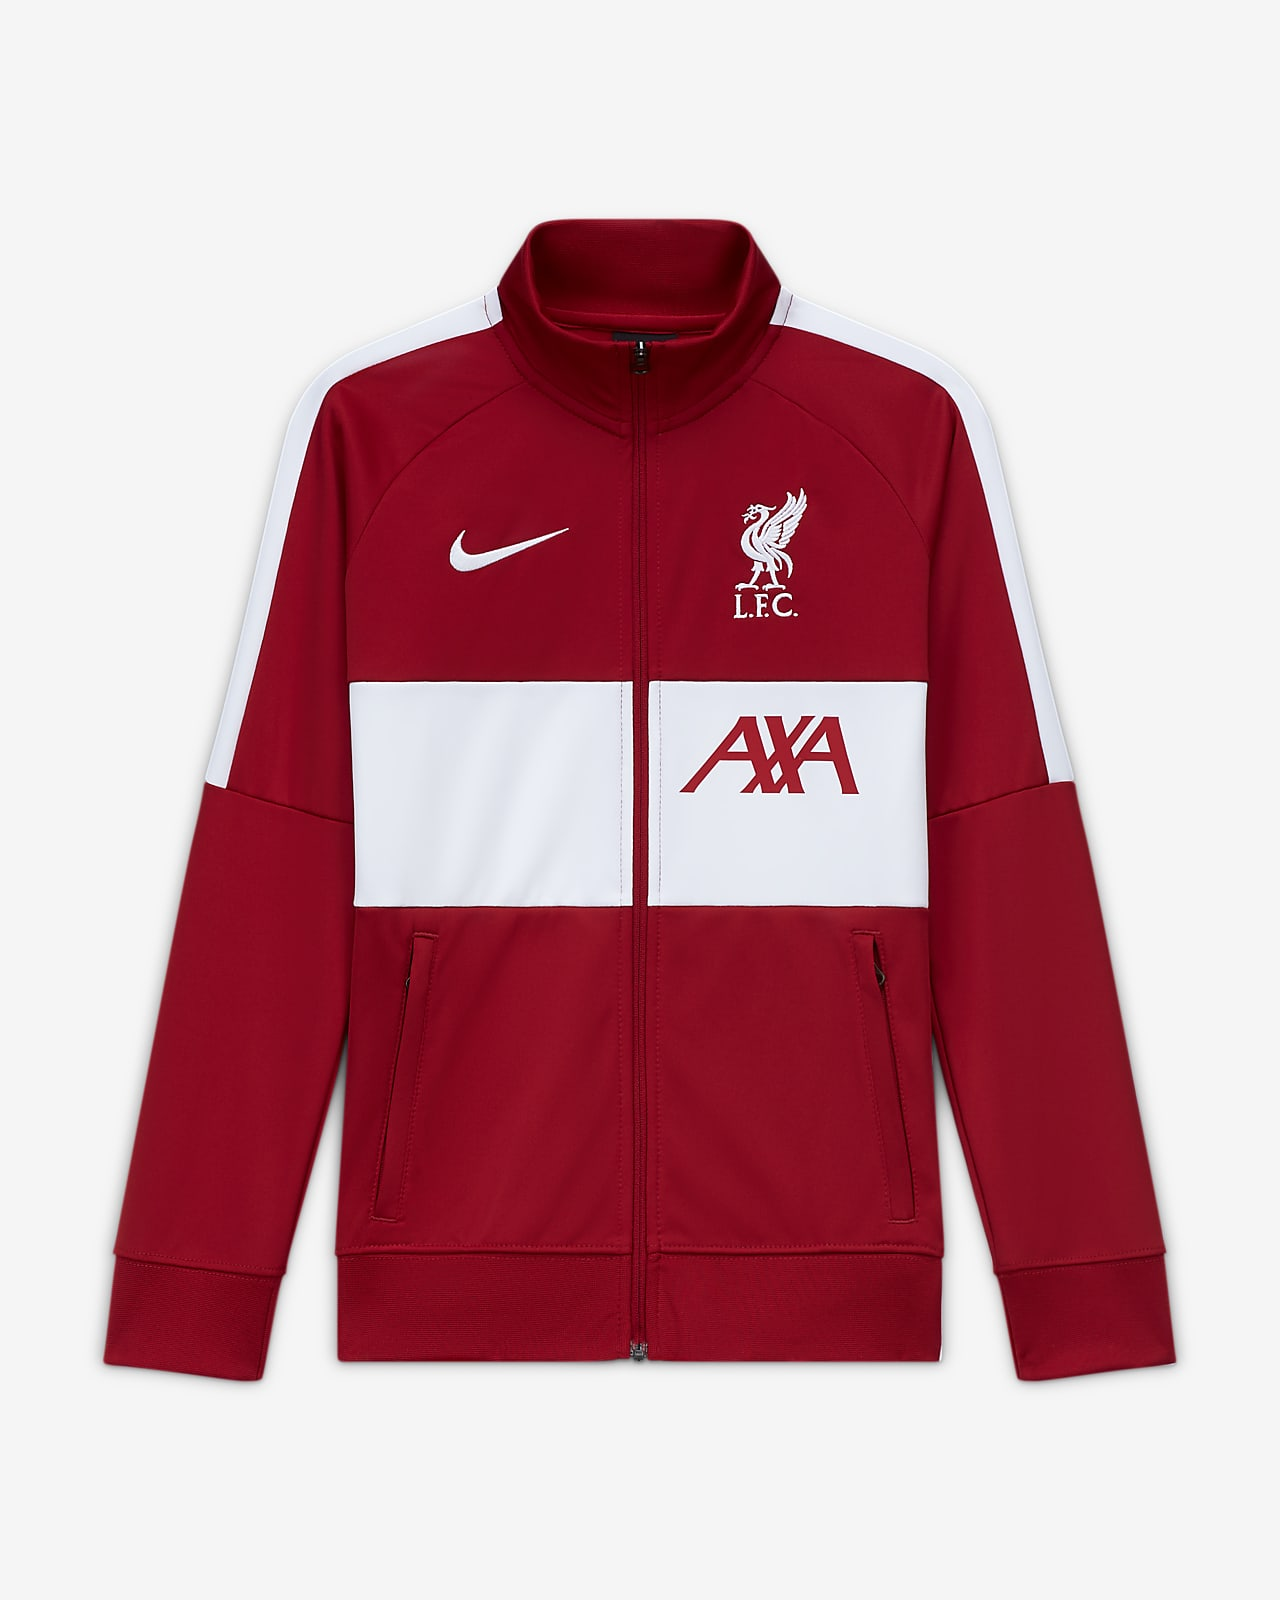 Liverpool FC Chaqueta deportiva de fútbol - Niño/a